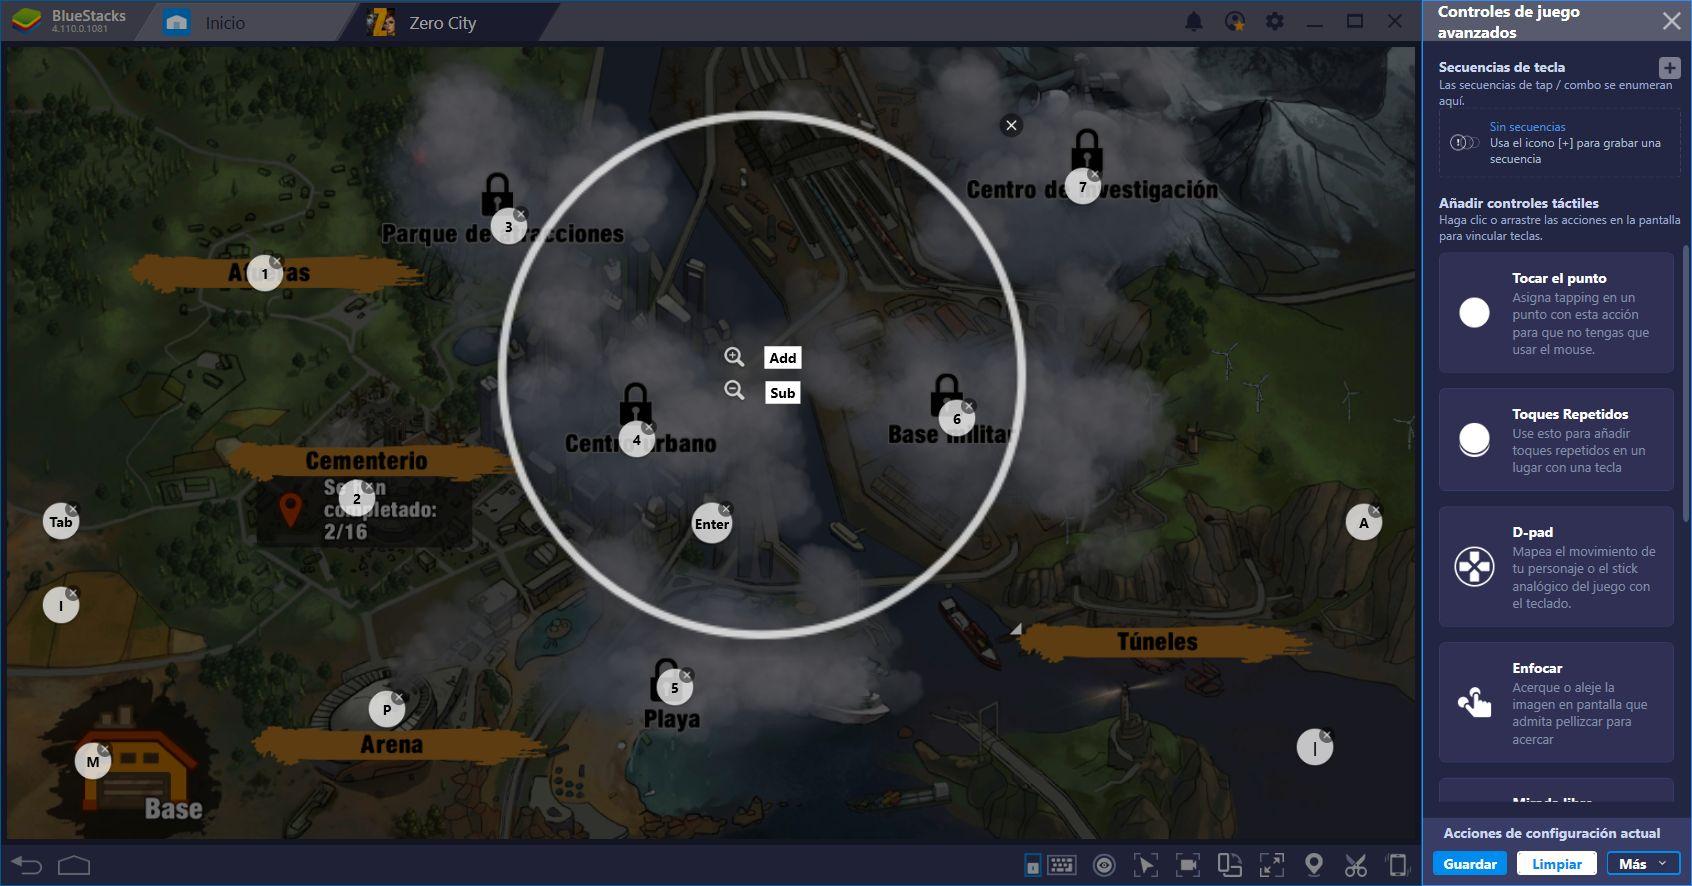 Enfrenta el Apocalipsis Zombi en Zero City con BlueStacks